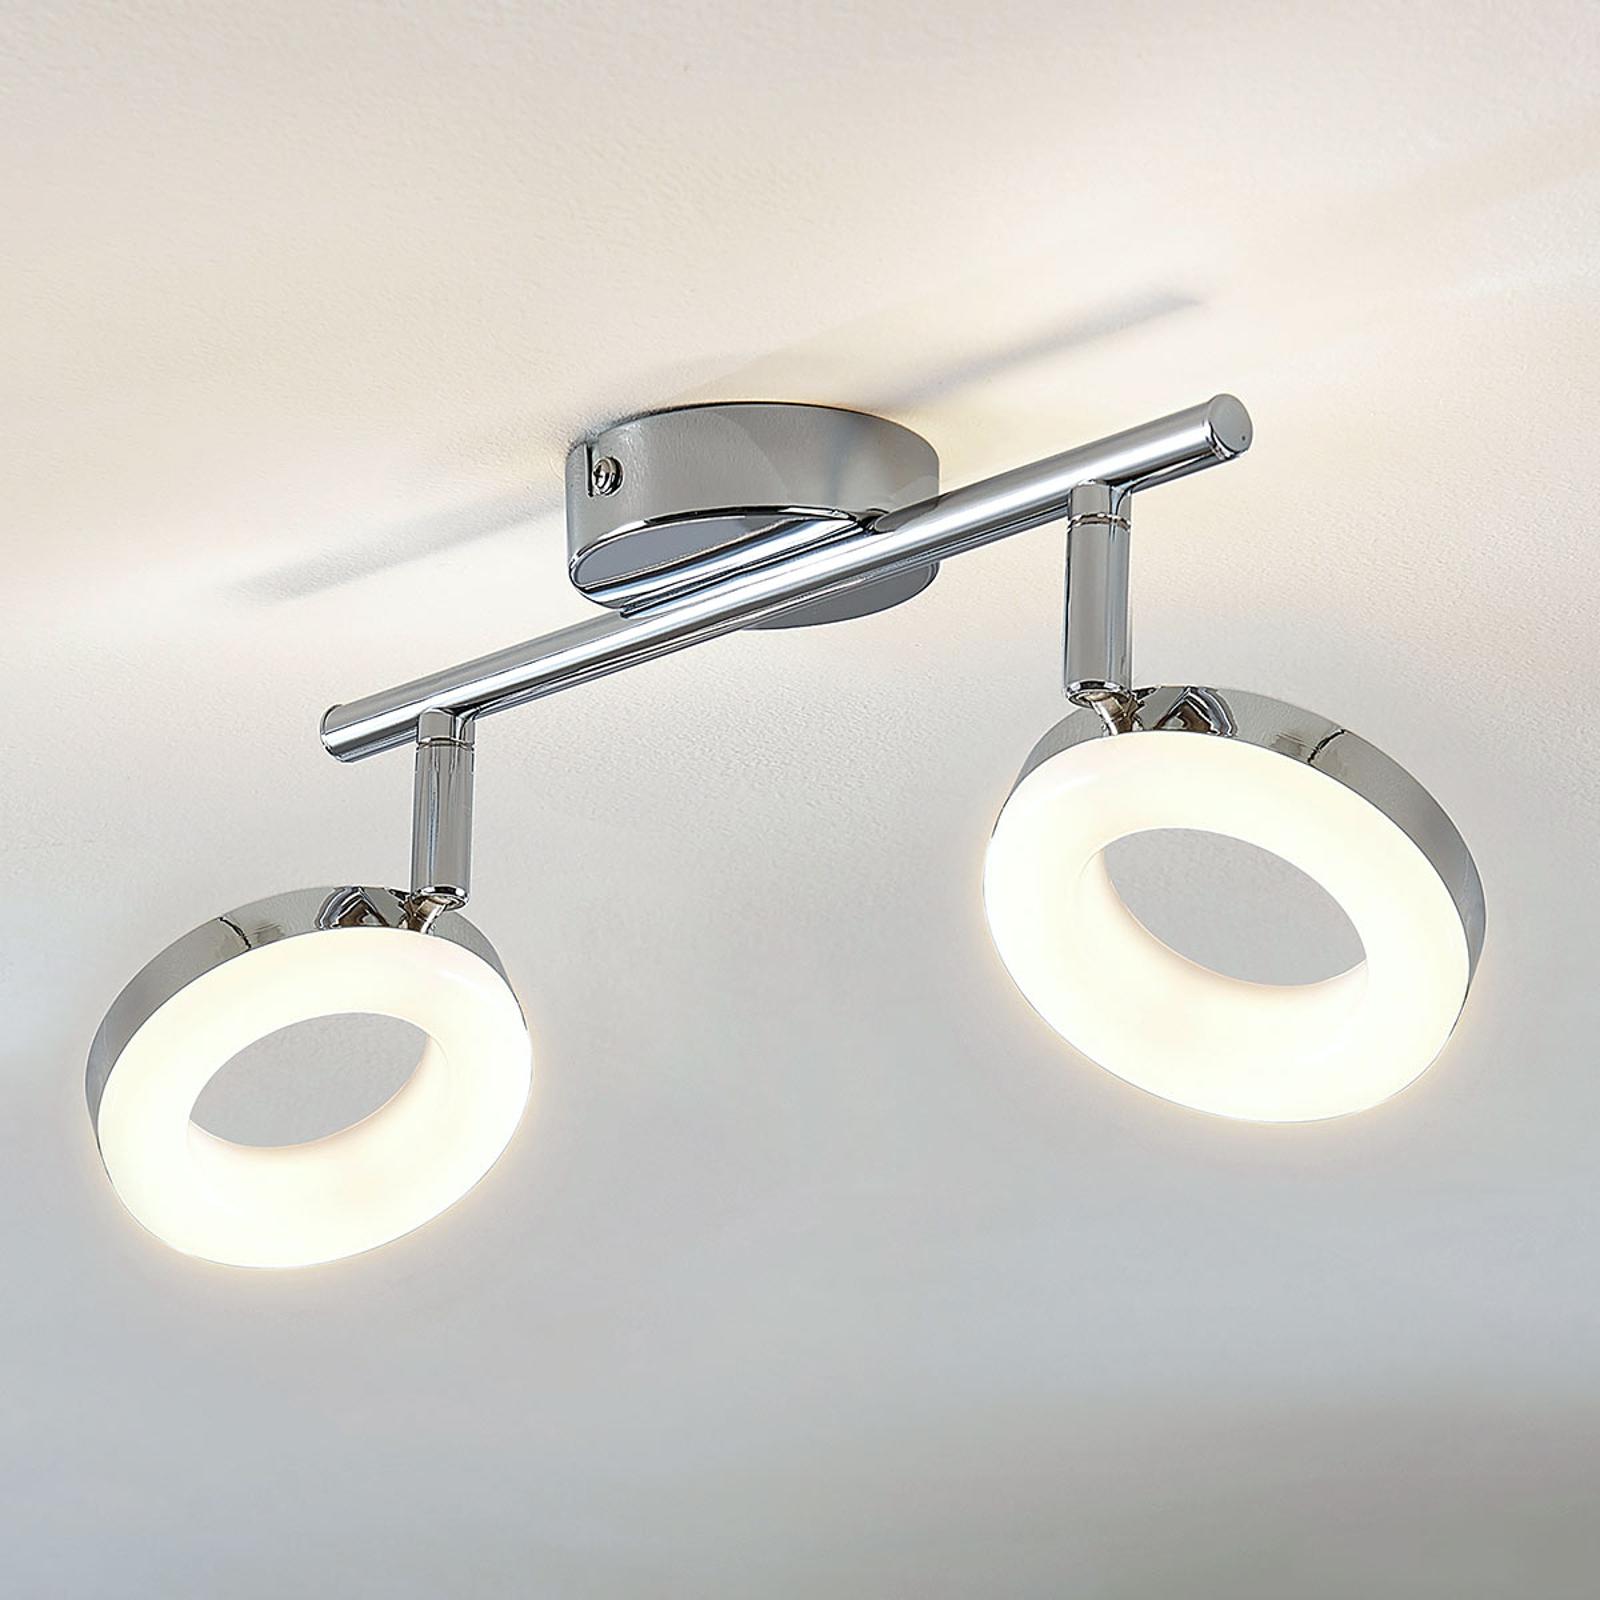 LED-taklampe Ringo 2 lyskilder